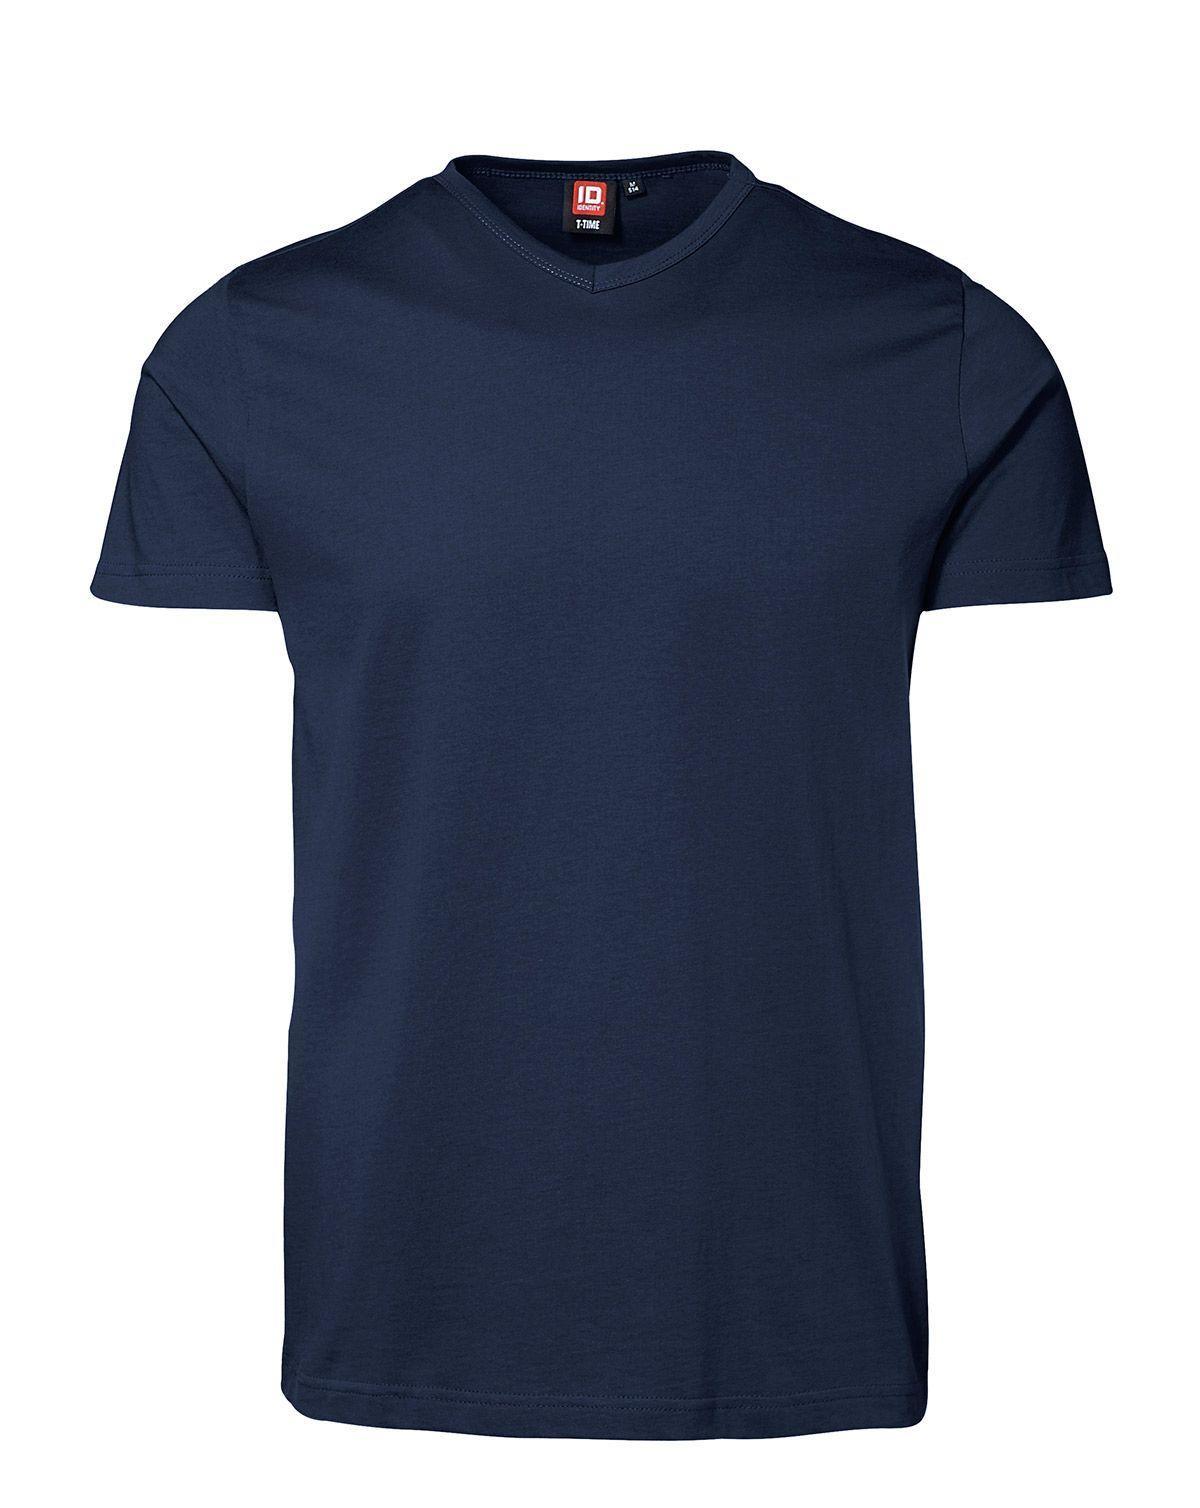 ID V-hals T-shirt (Navy, 2XL)